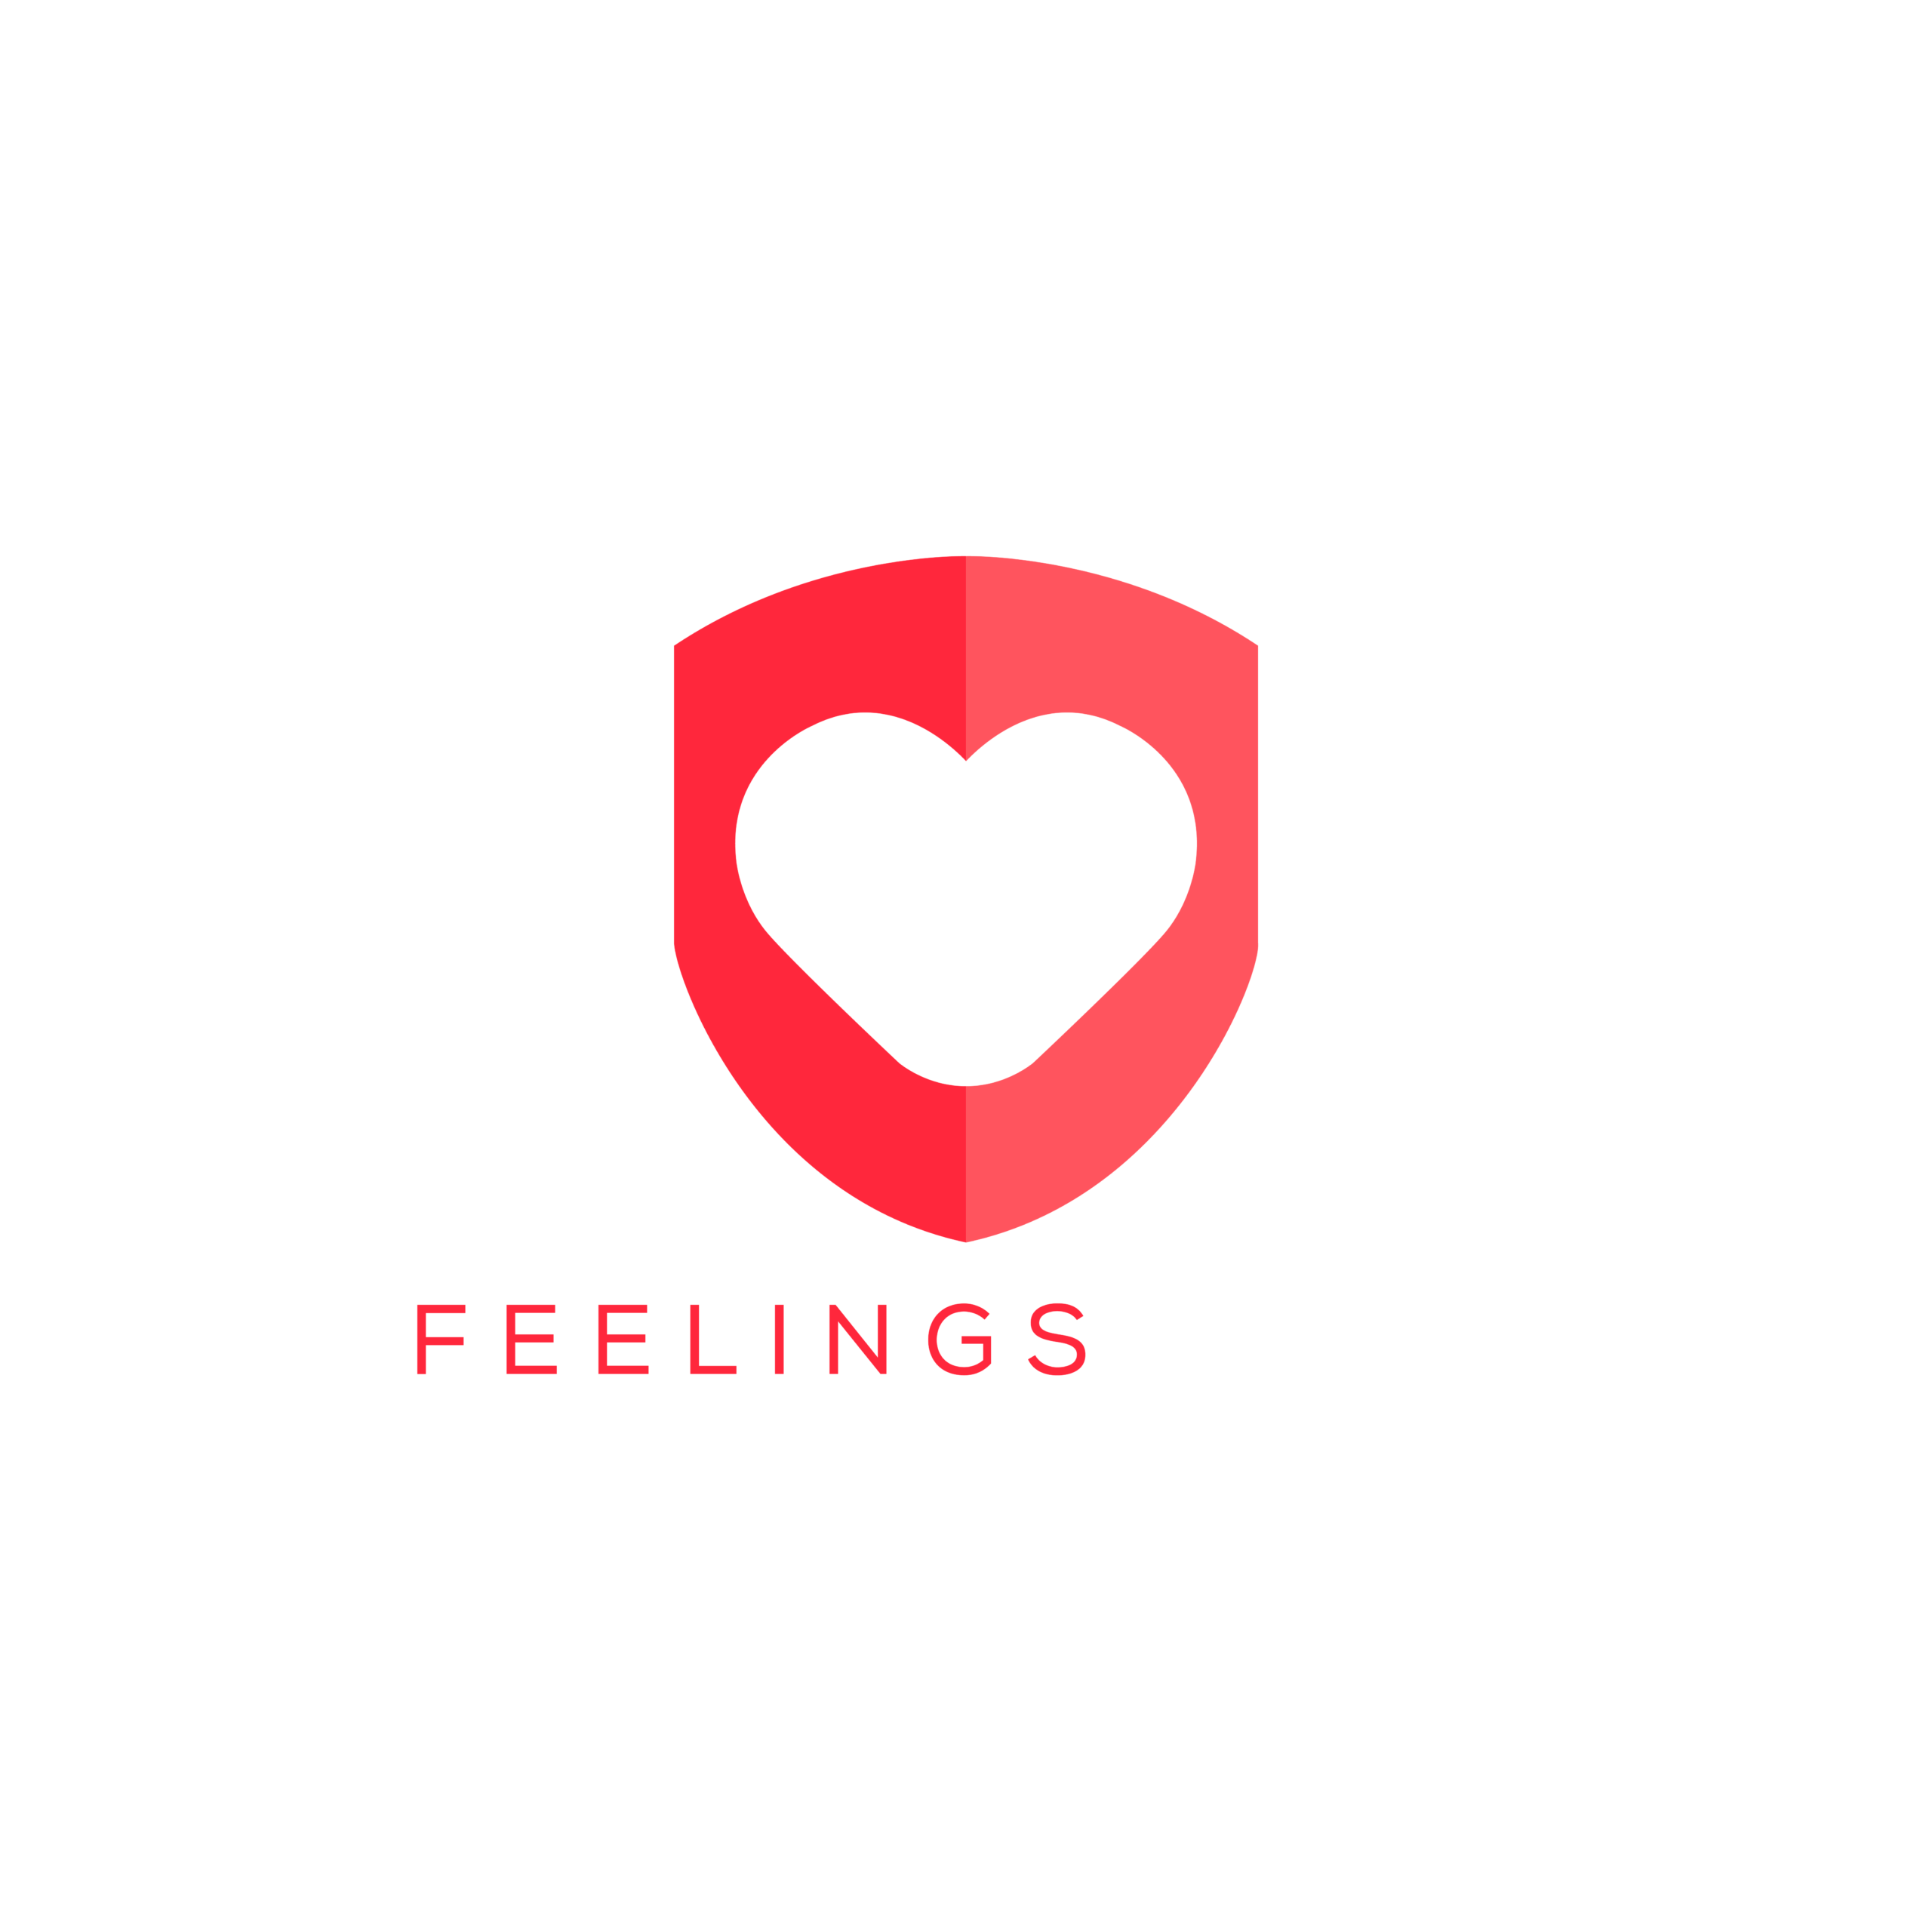 Feelings First Shadow Work